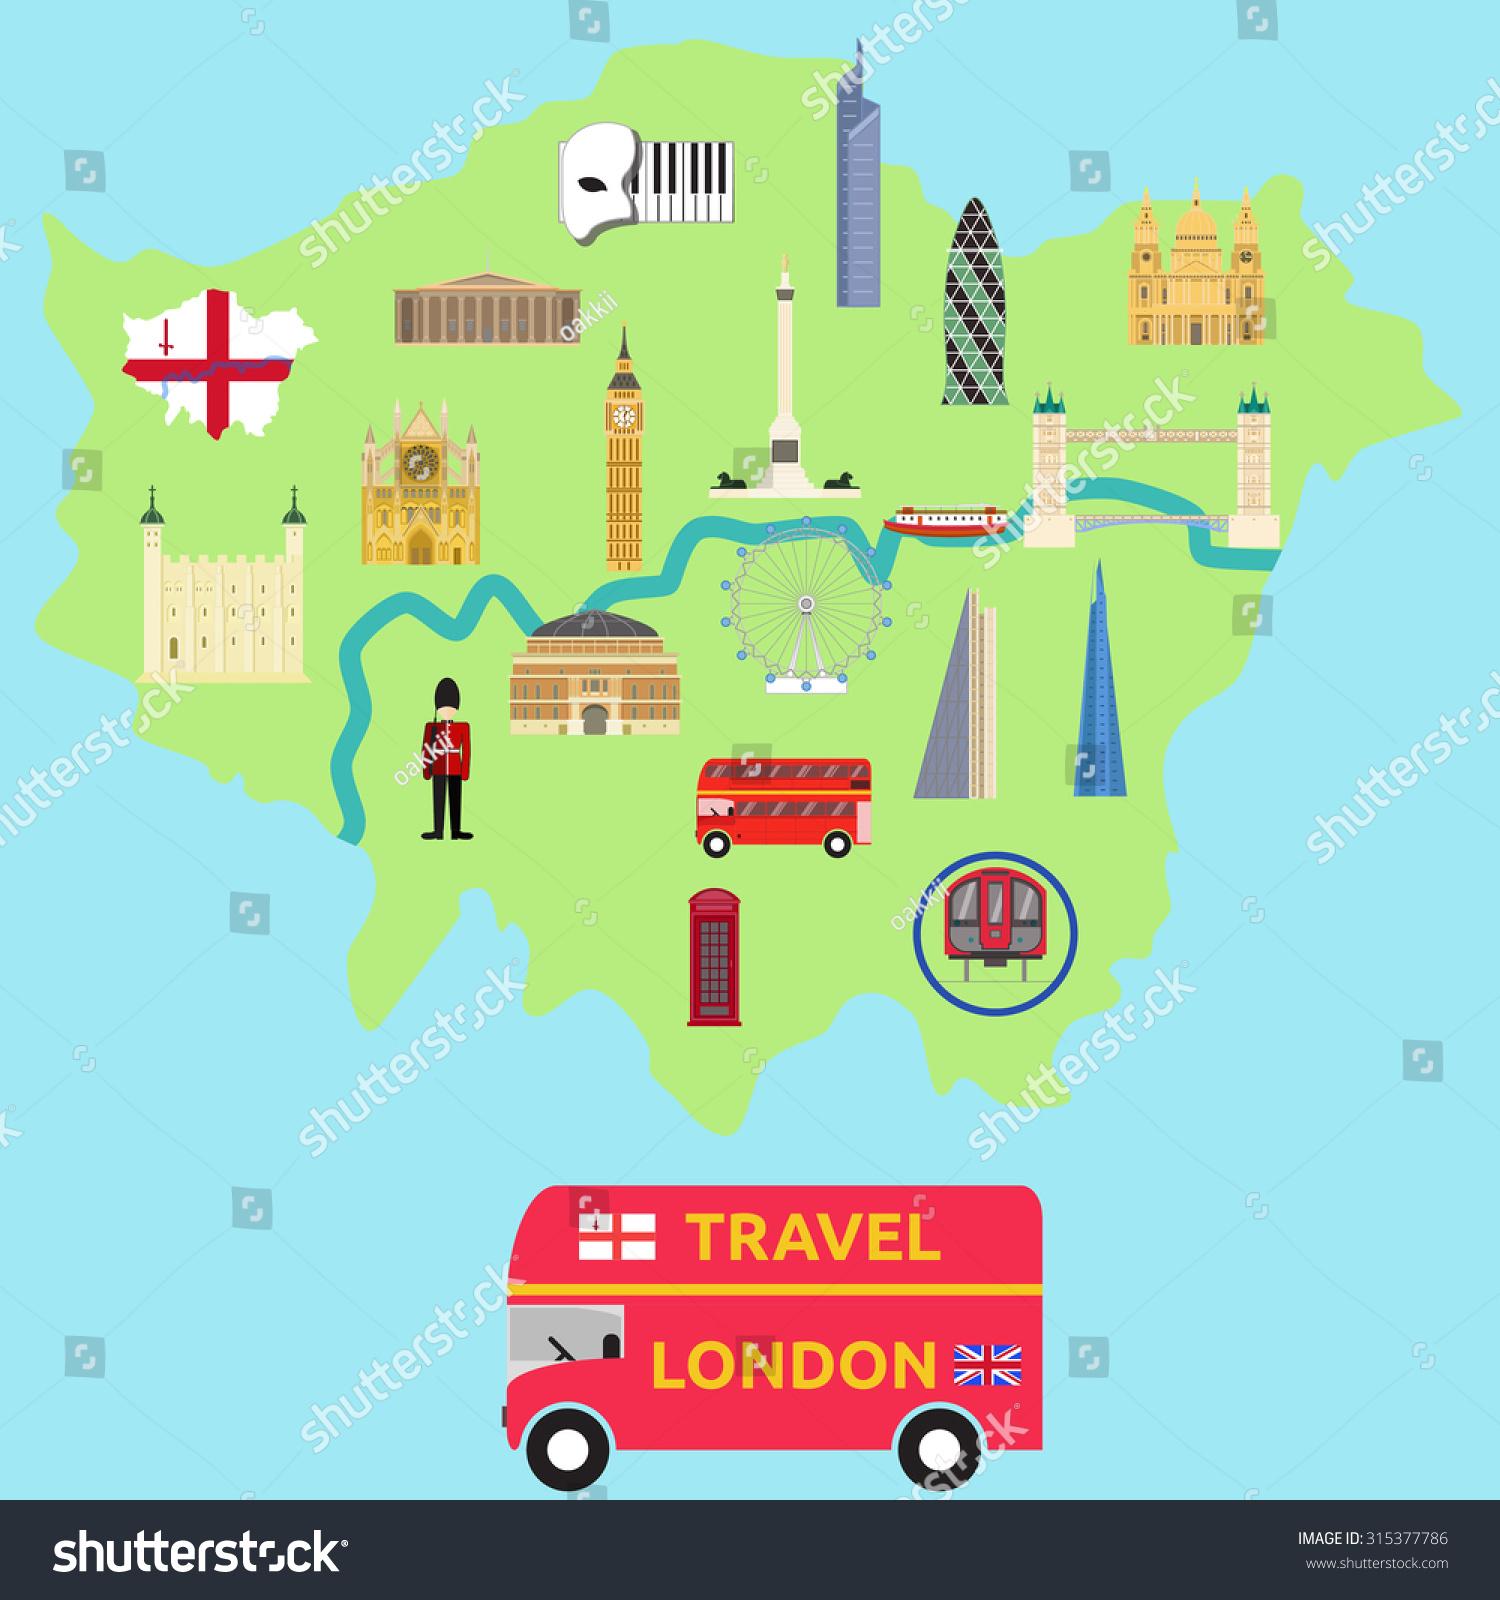 map of london attraction landmarkbridge big ben museum bus london